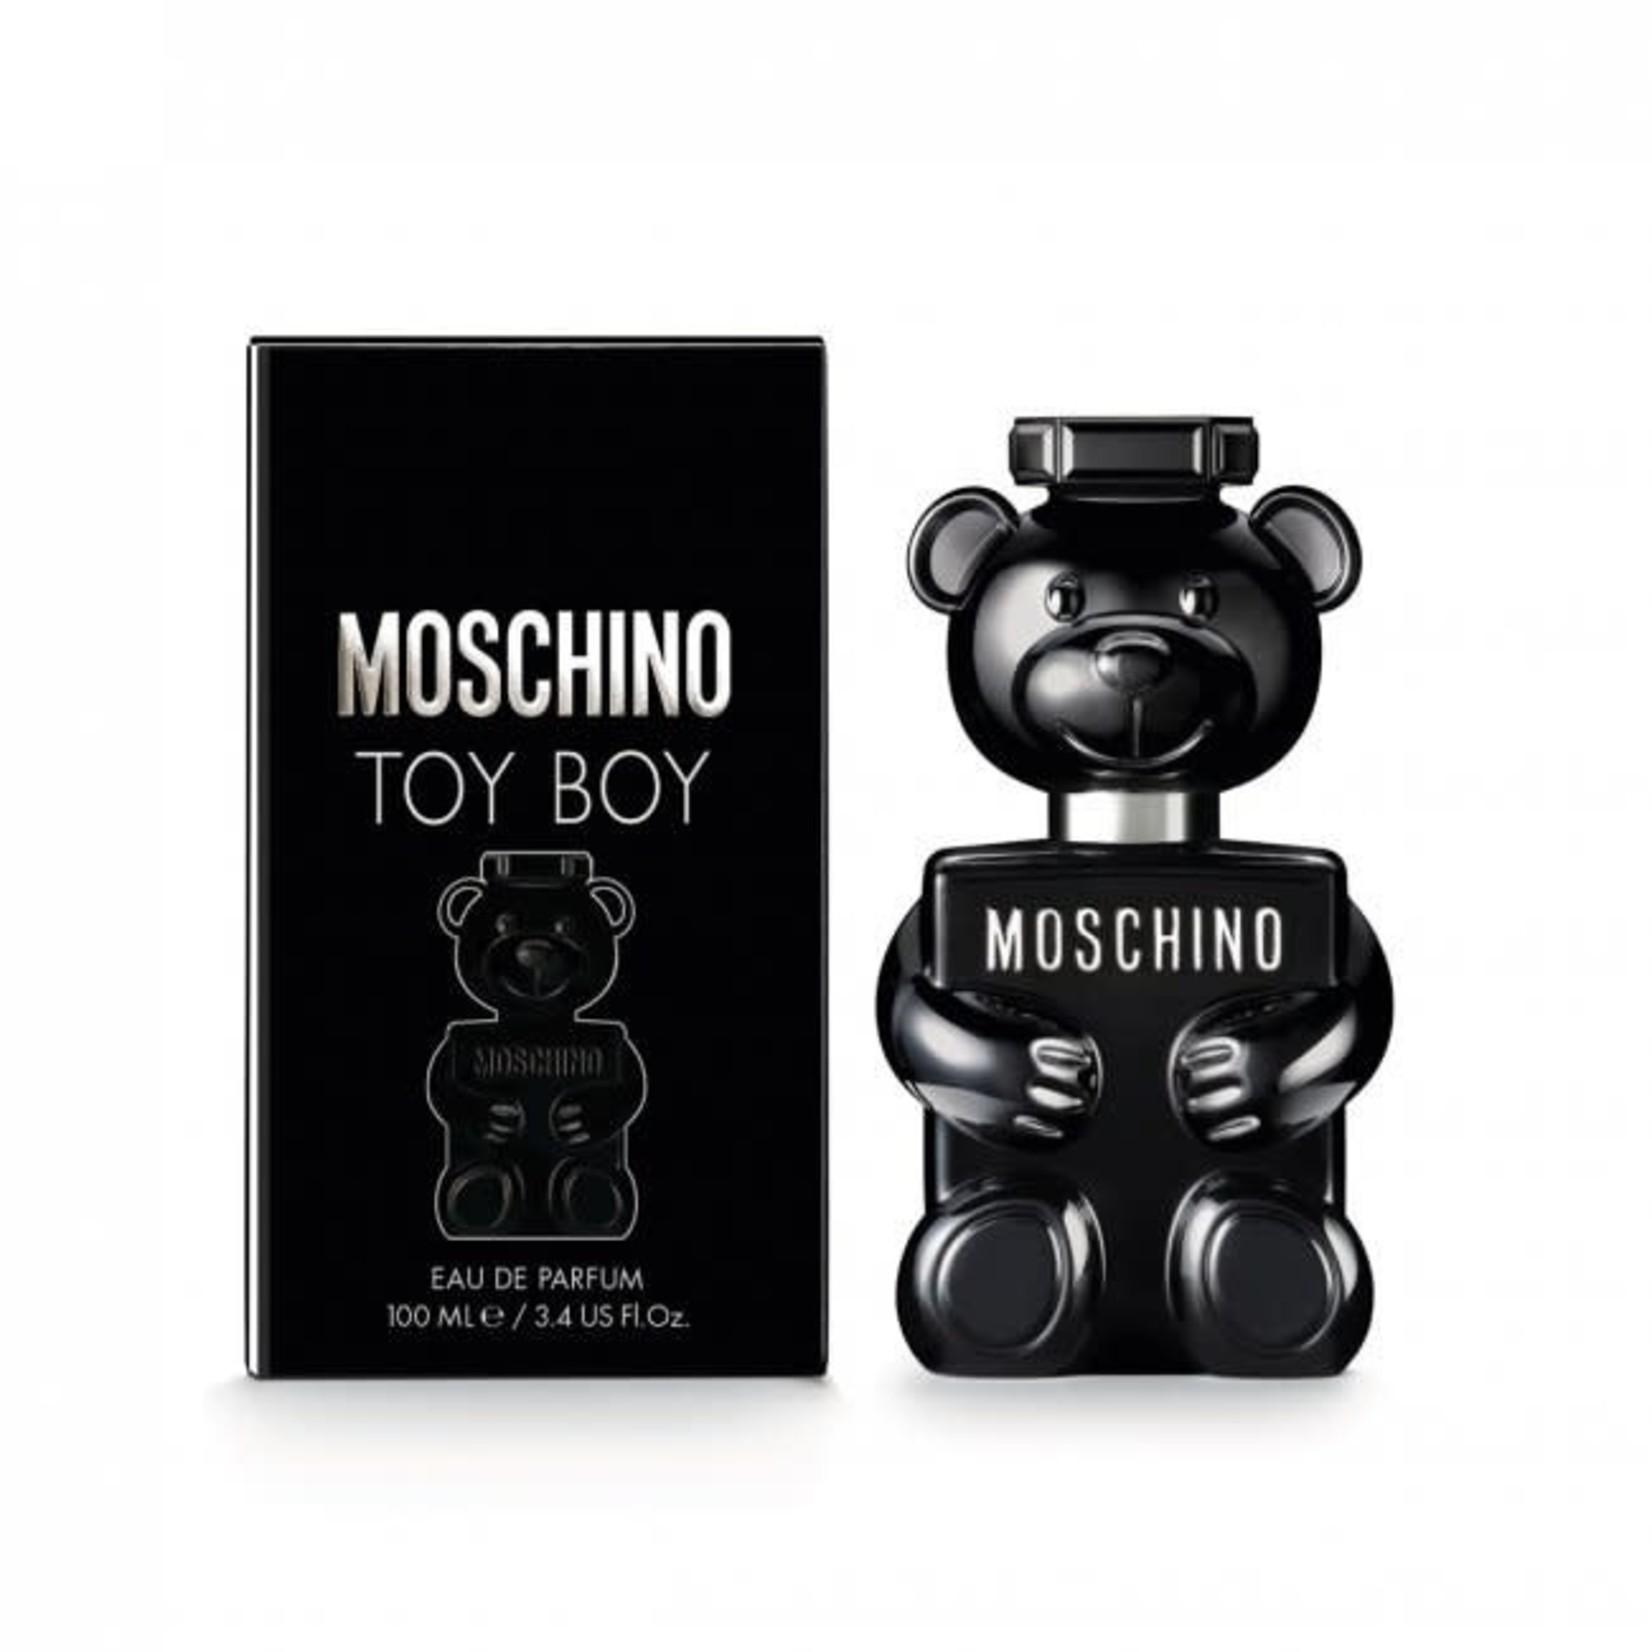 Moschino Toy Boy Eau De Parfum for Men 100ml